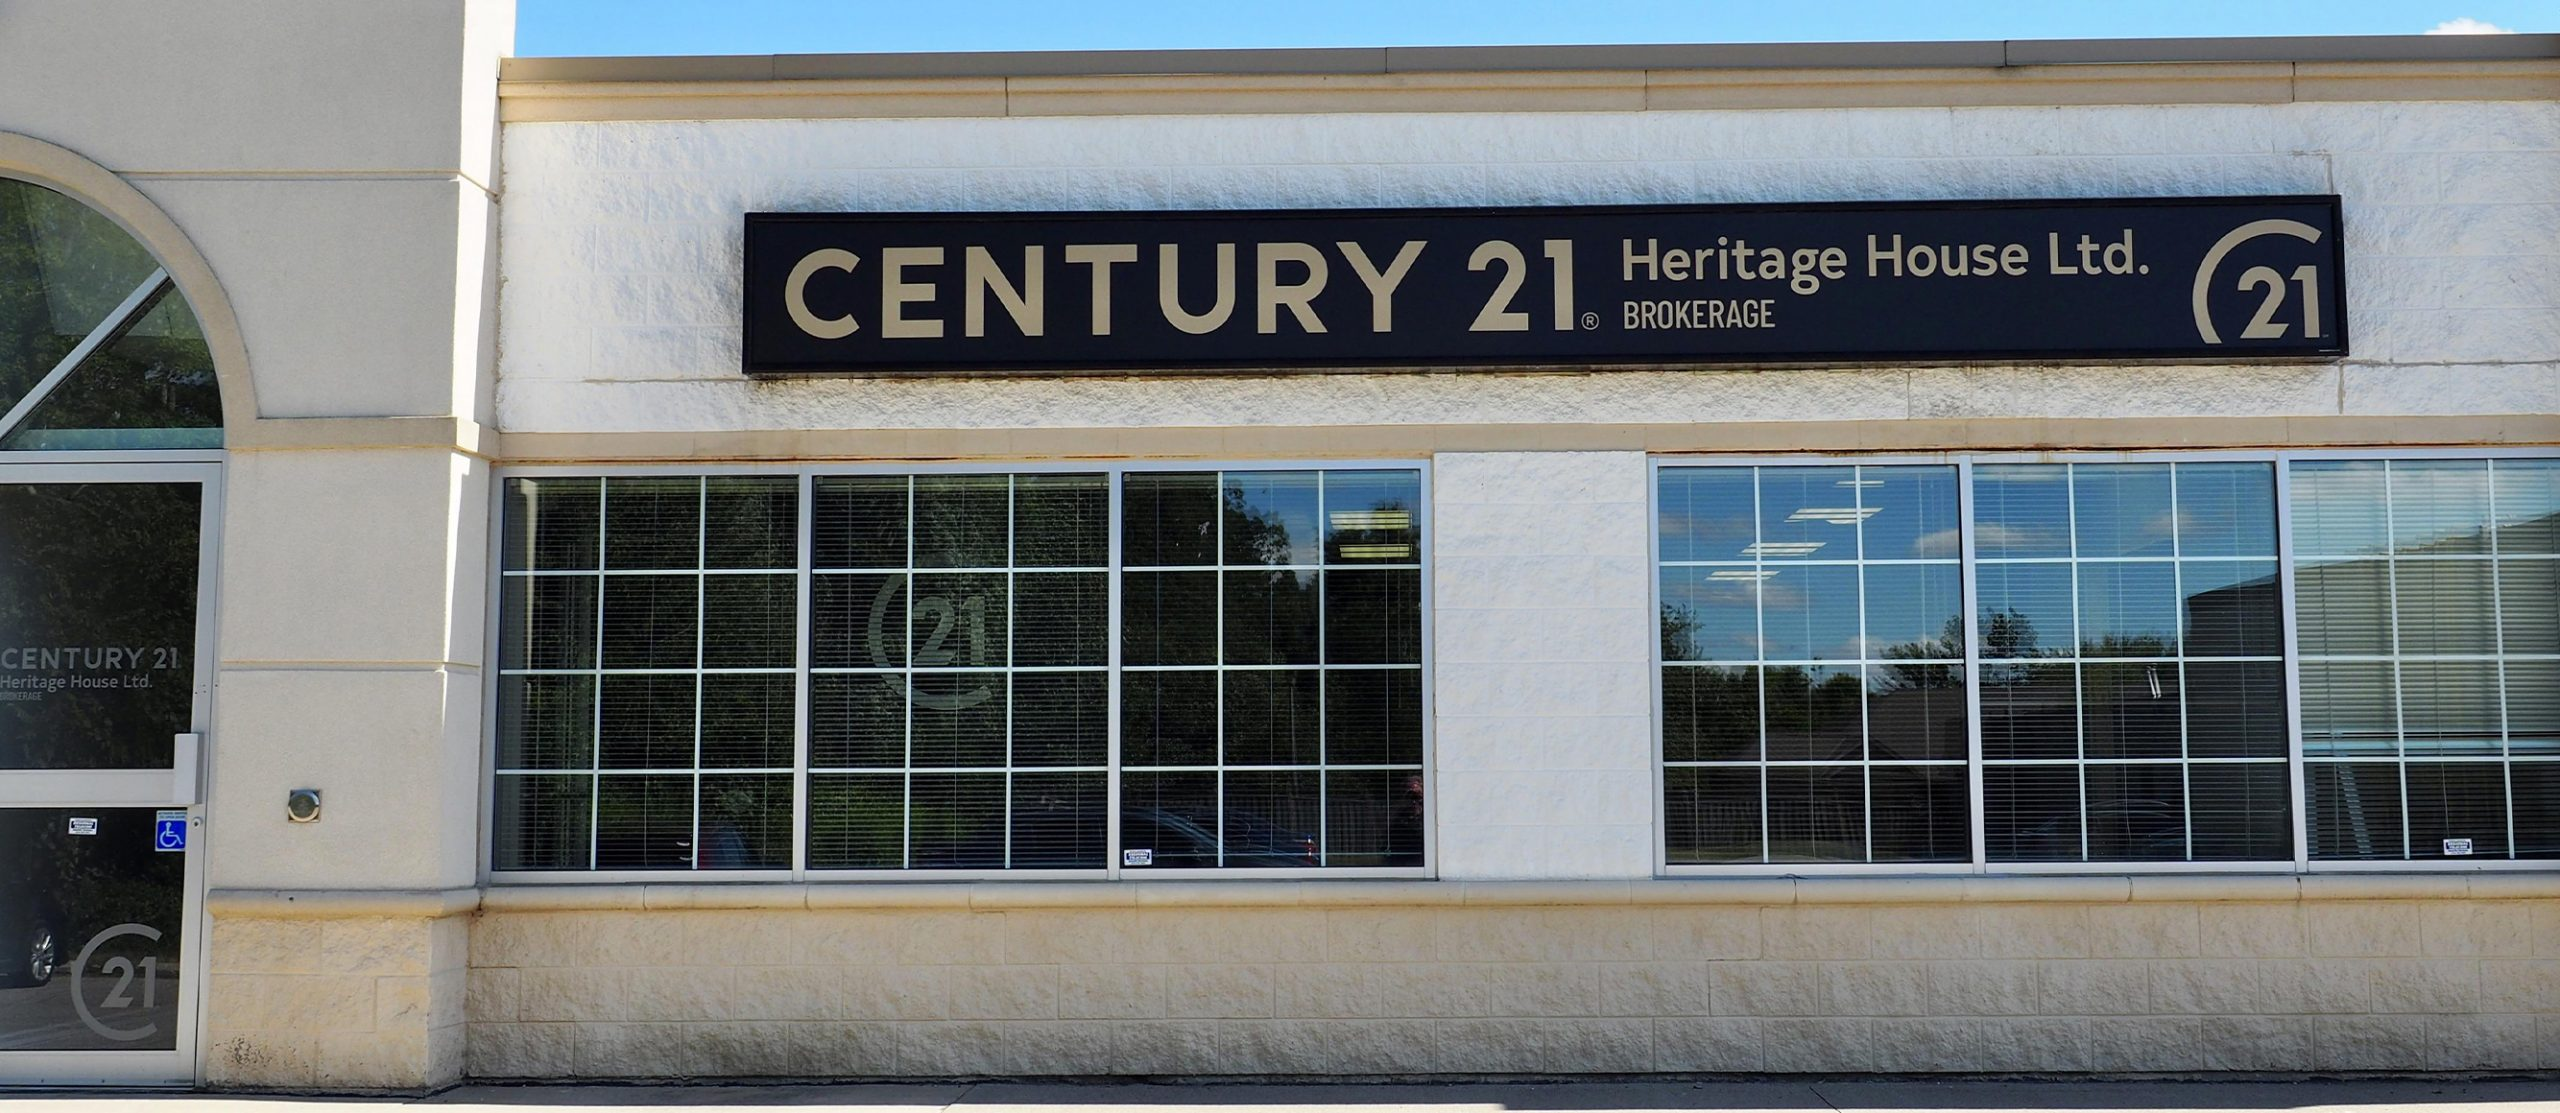 C21 Heritage House Ltd